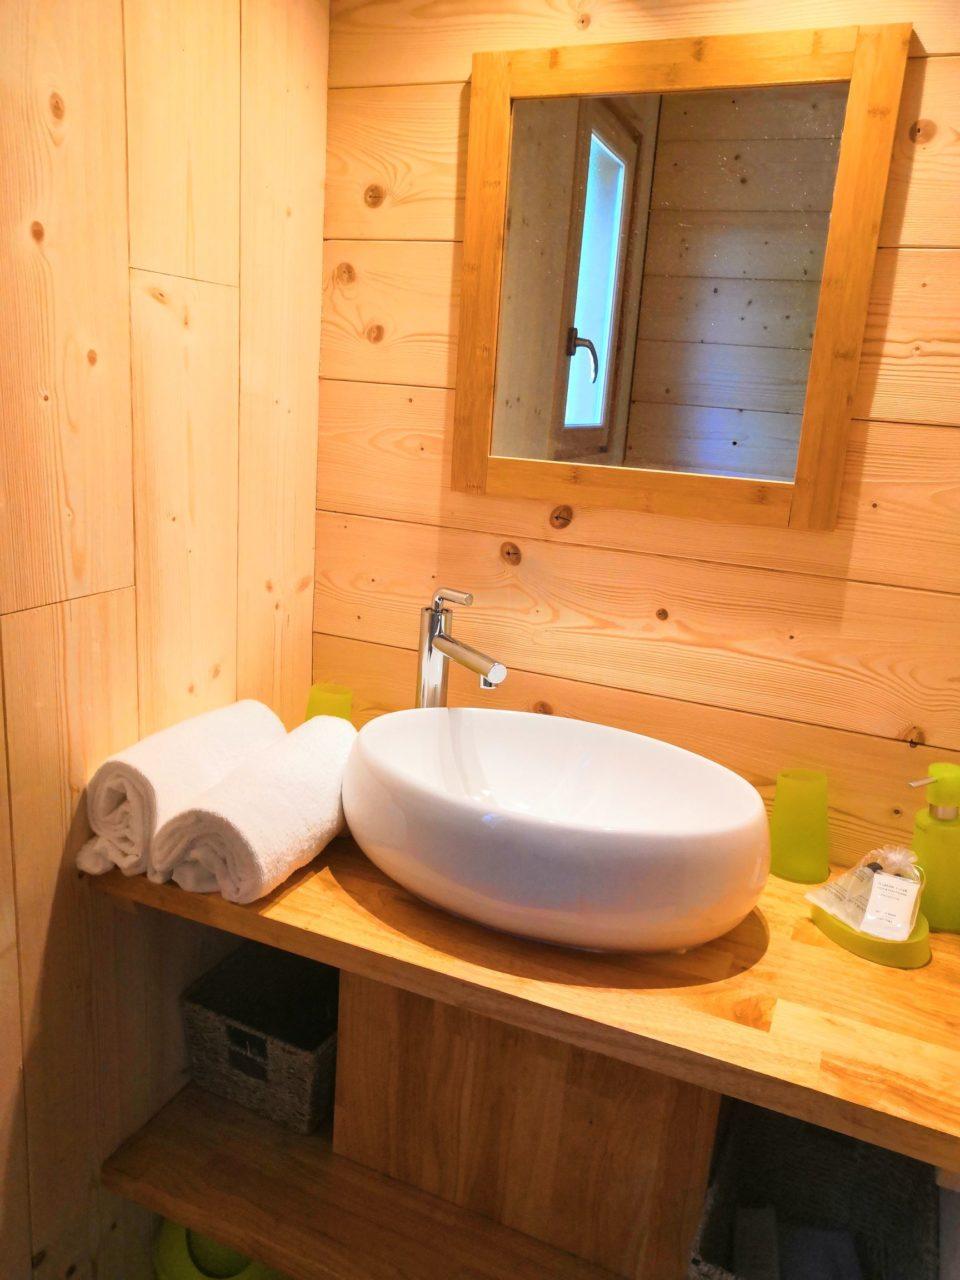 salle de bain cabane insolite sarlat avec sauna hammam jacuzzi piscine chauffee Dordogne